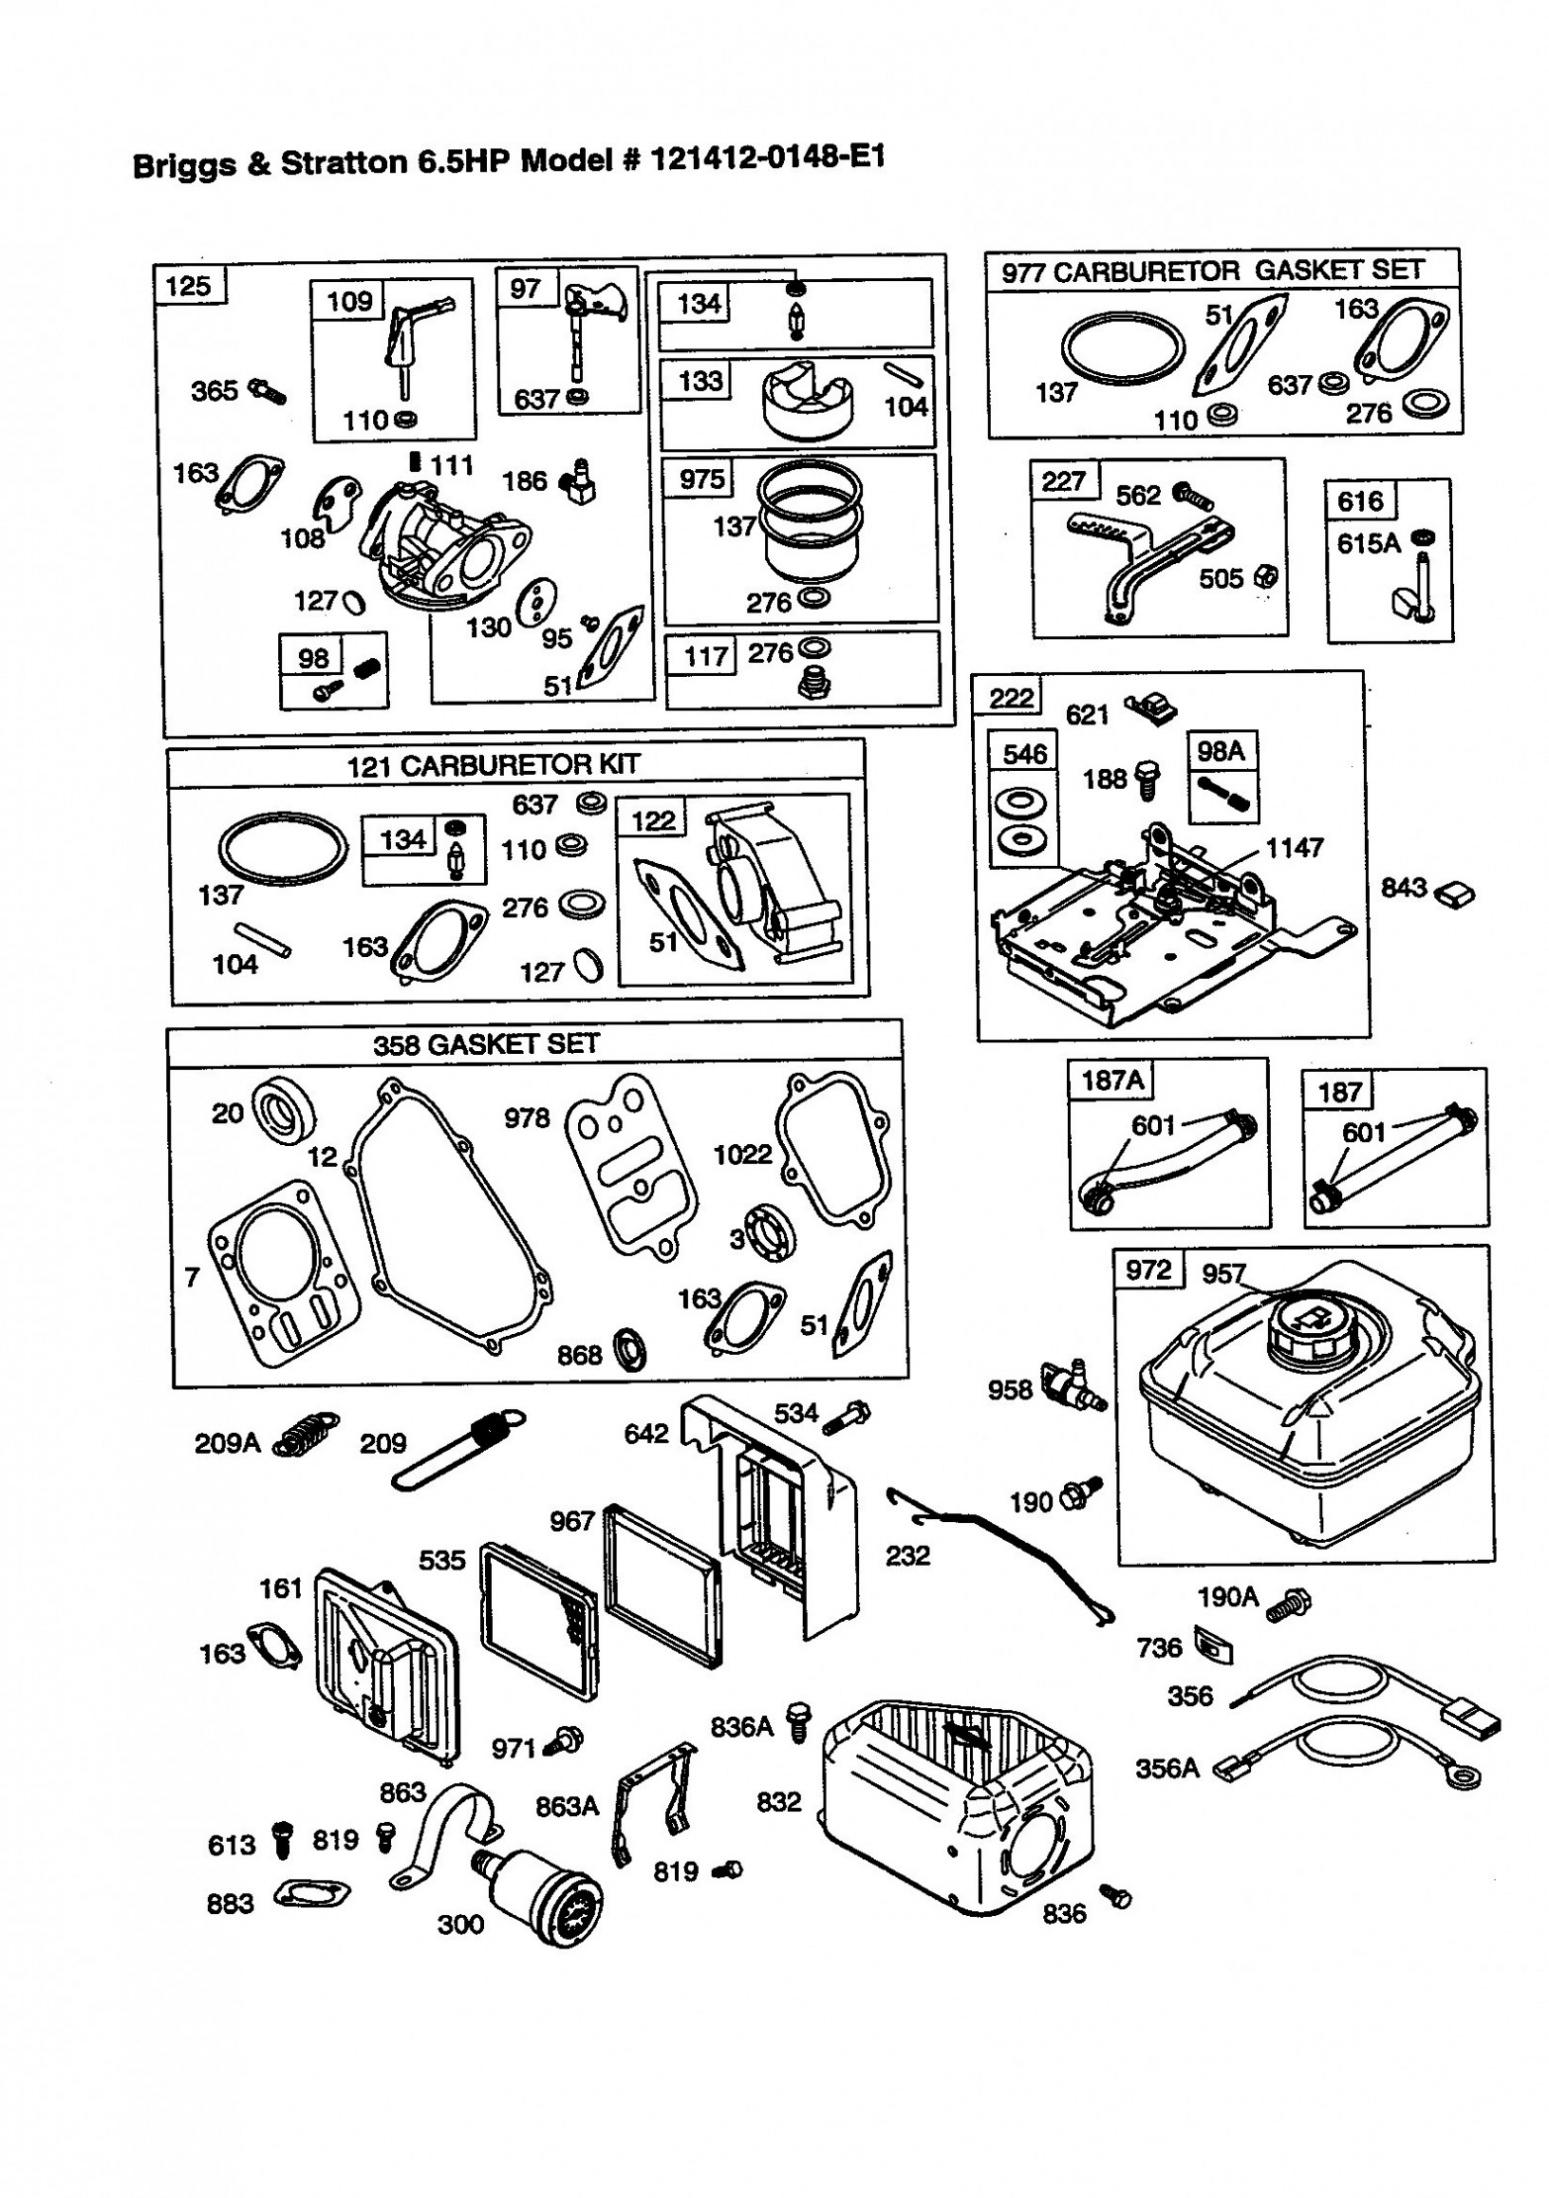 Wiring Diagram Briggs Stratton Engine Archives Gidn Co Best – Briggs - Briggs And Stratton V Twin Wiring Diagram